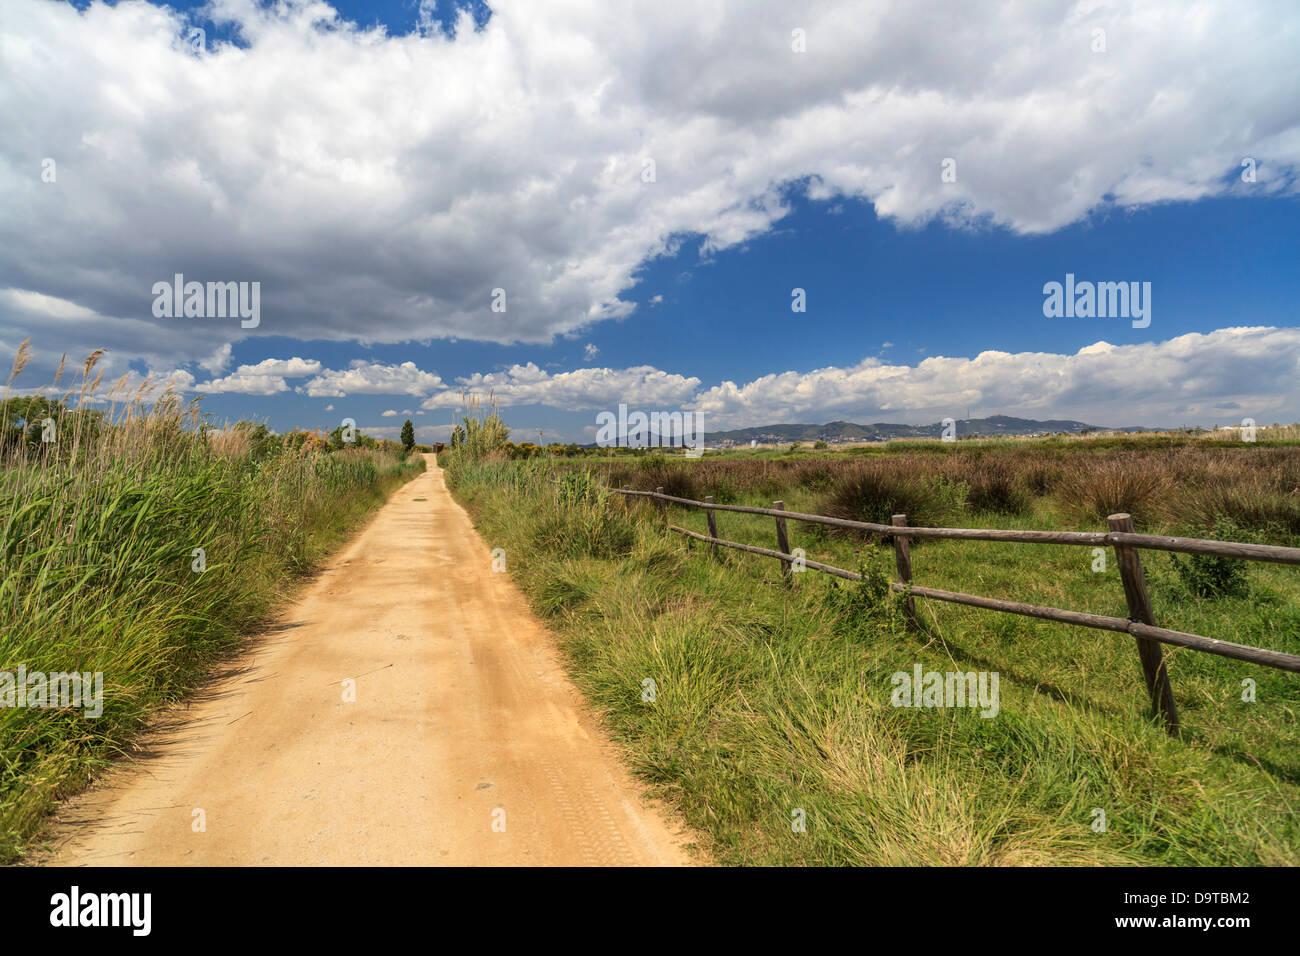 Prat de llobregat,catalonia,spain - Stock Image